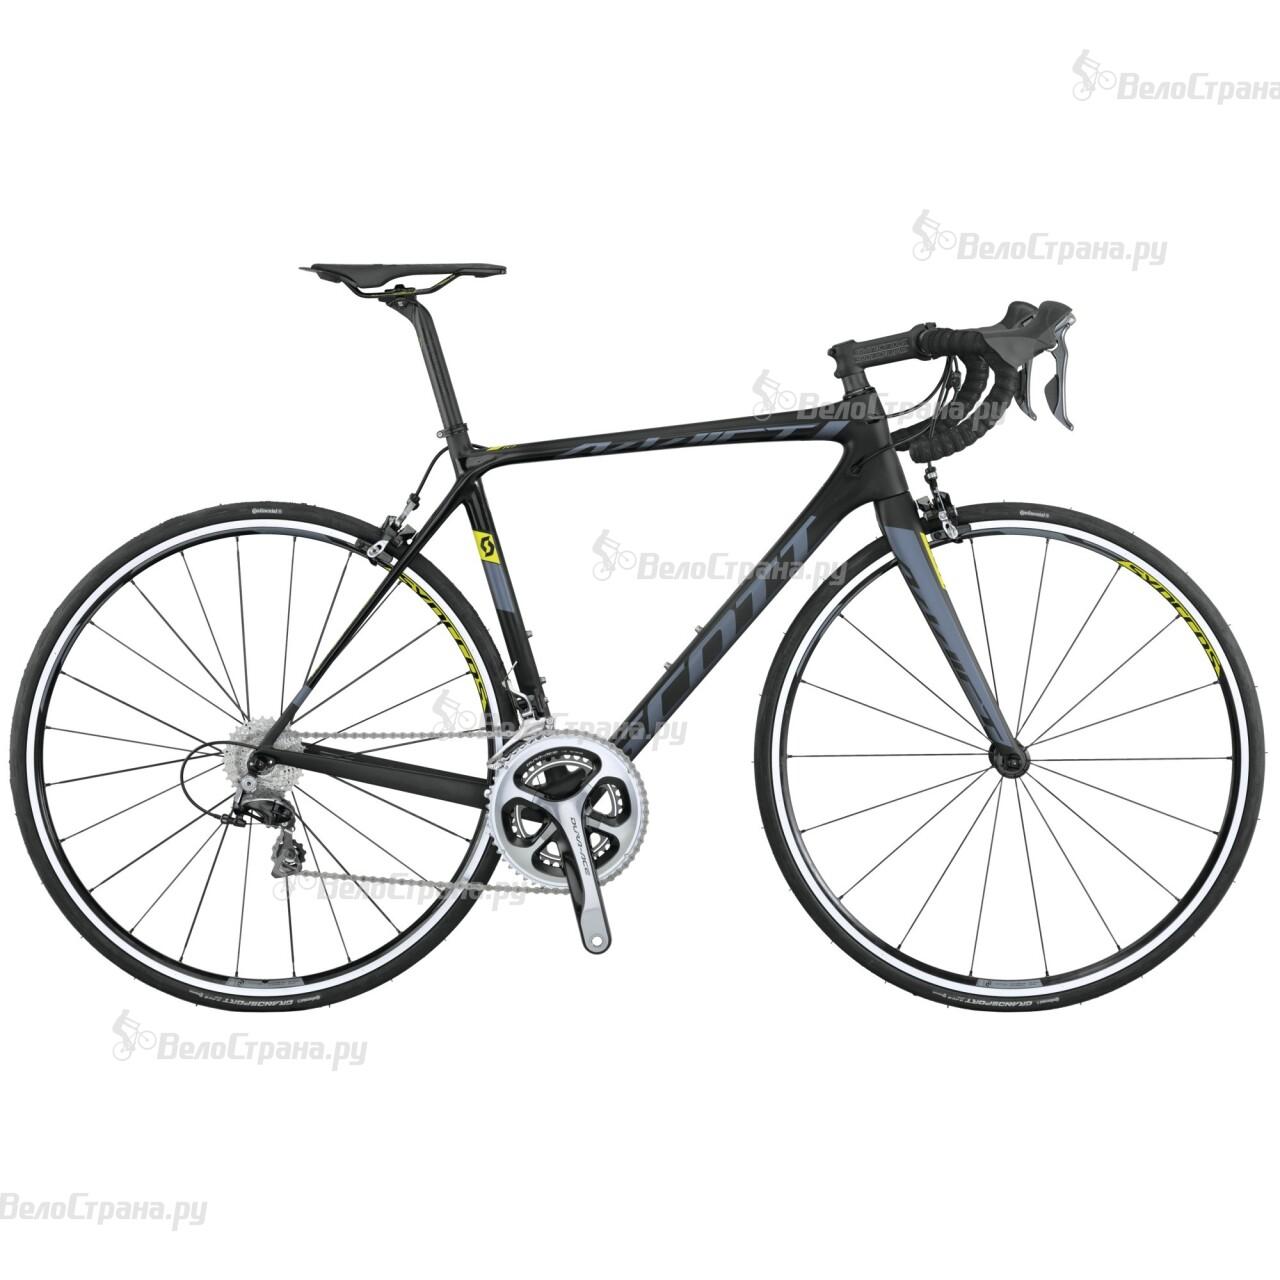 Велосипед Scott Addict 10 (2015) scott addict sl compact 2015